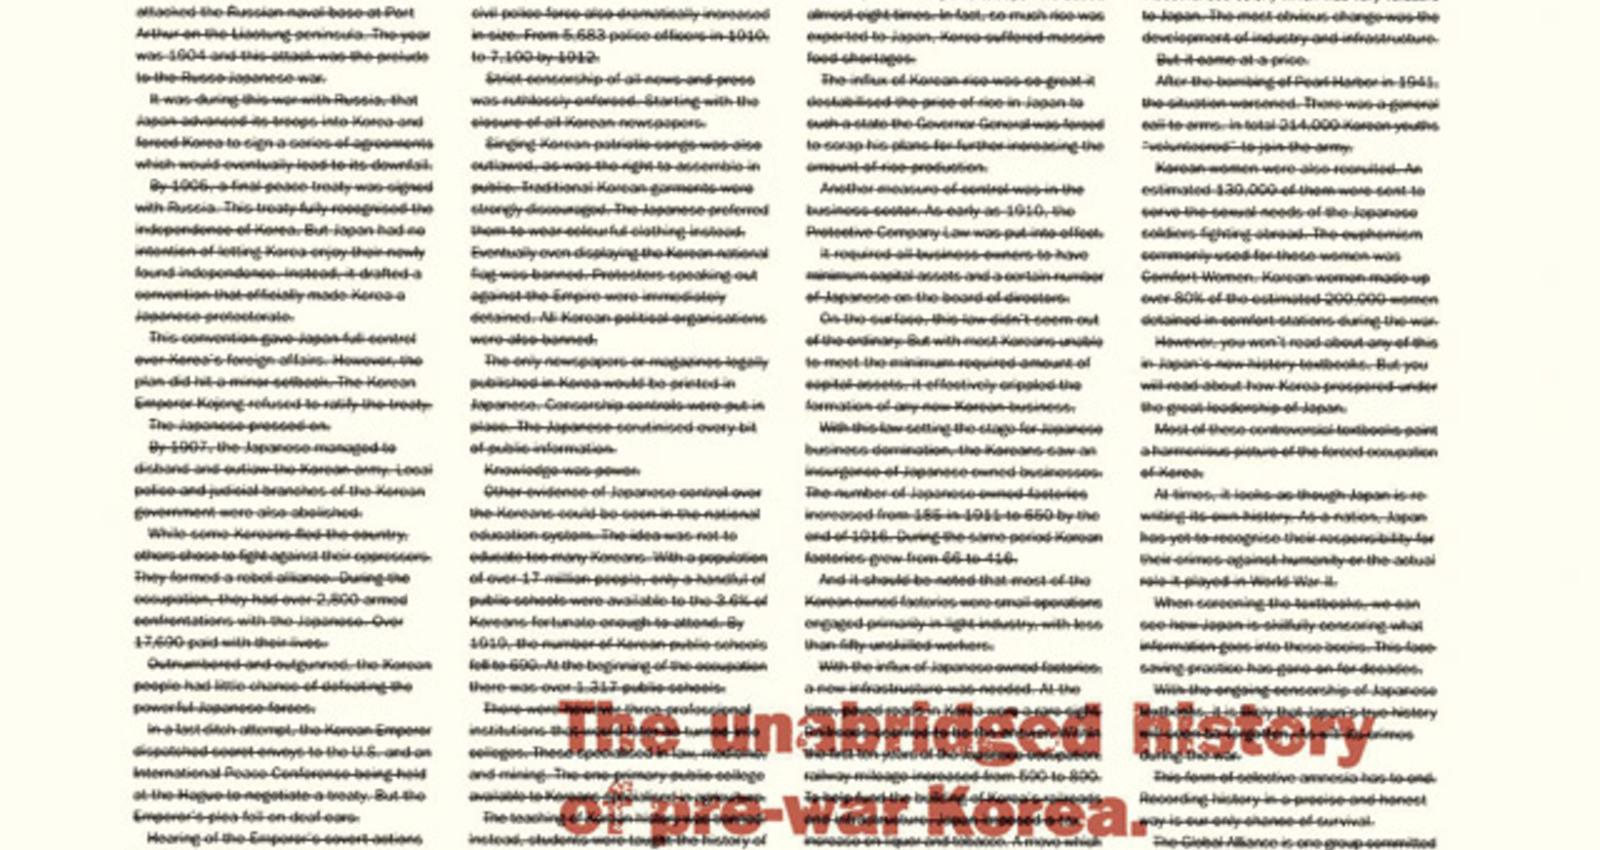 Comfort Women, Korea, Nanking